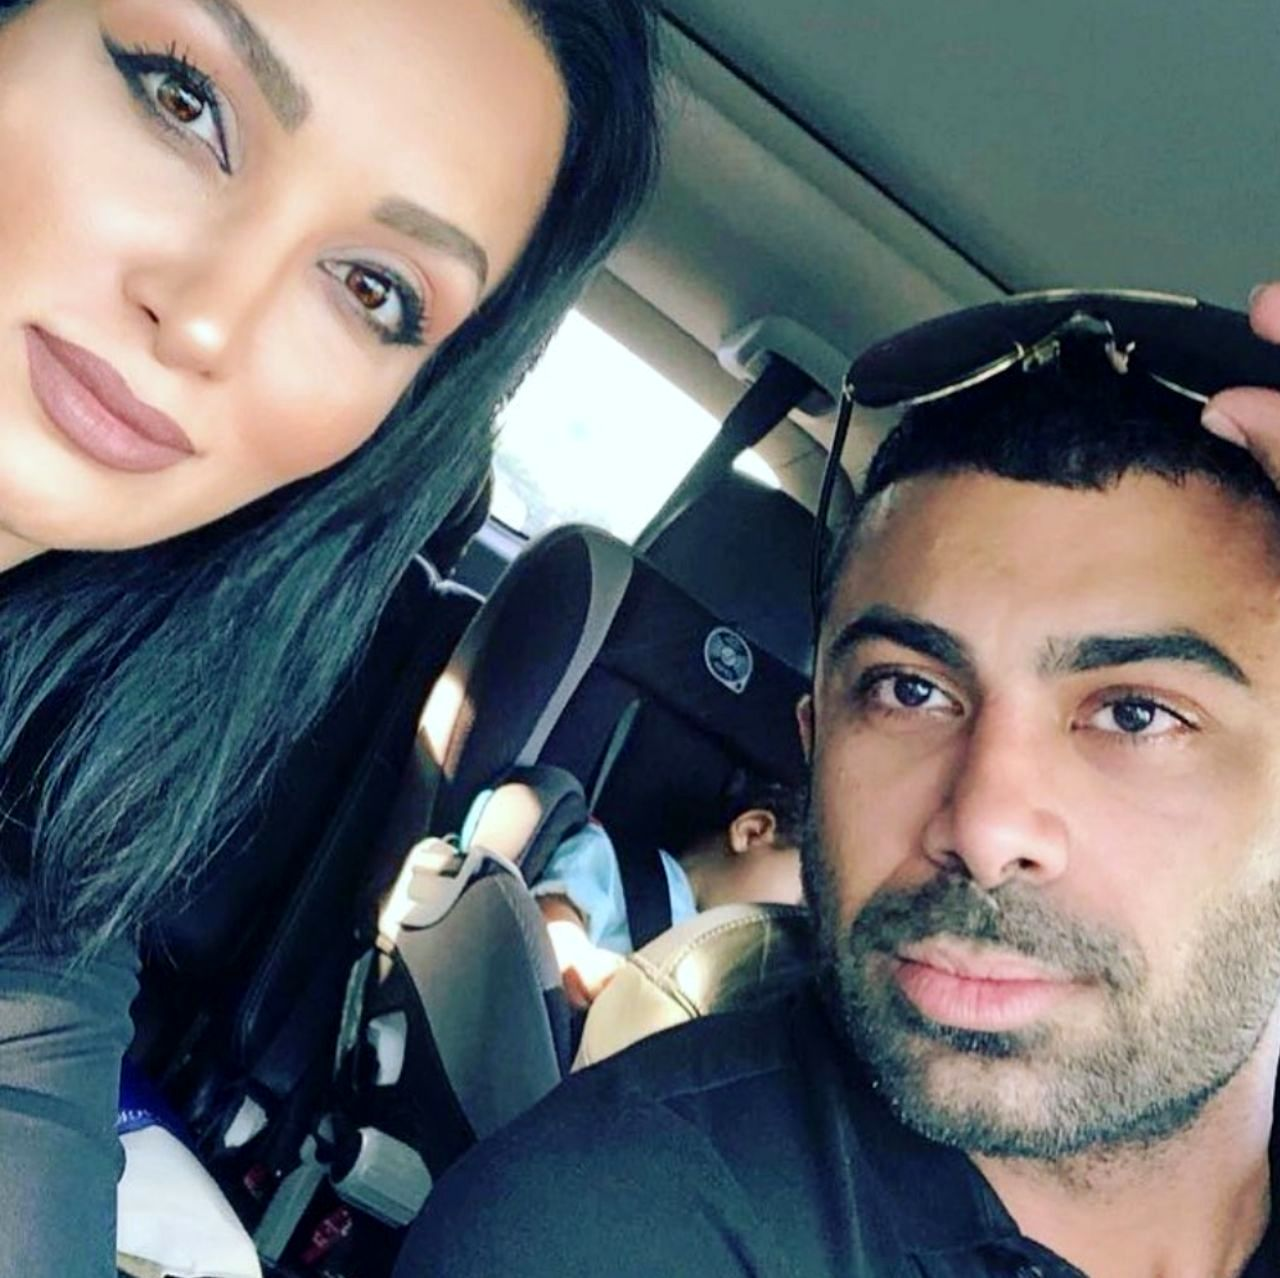 سلفی ماشینی روناک یونسی و همسرش | 24 آنلاین